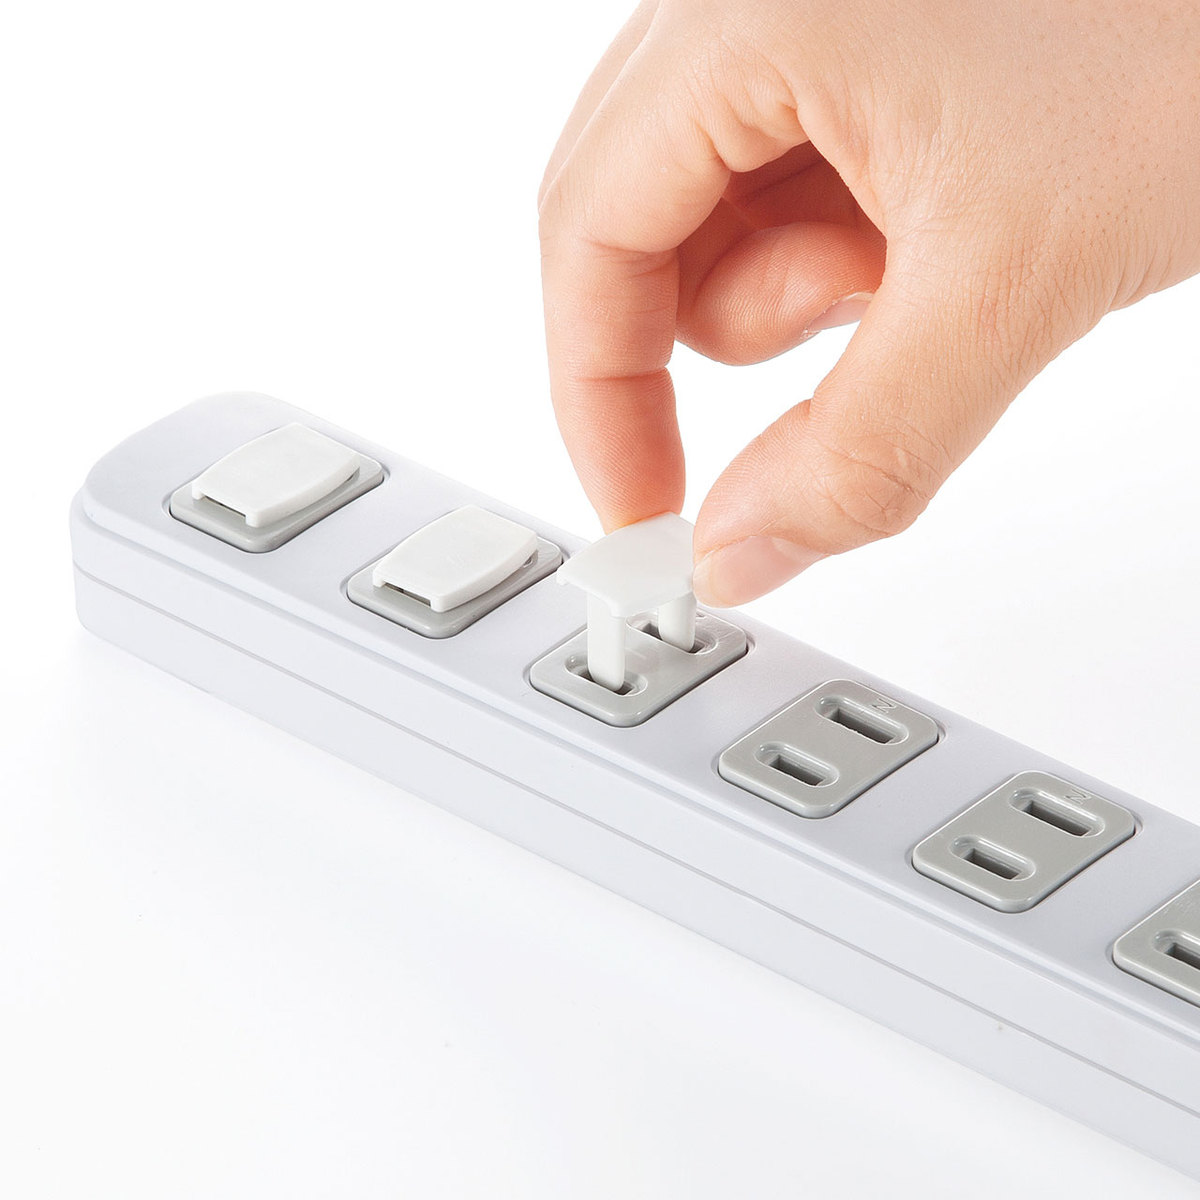 [TAP-CAP2P100] コンセント安全キャップ(2P用・100個入・ホワイト)